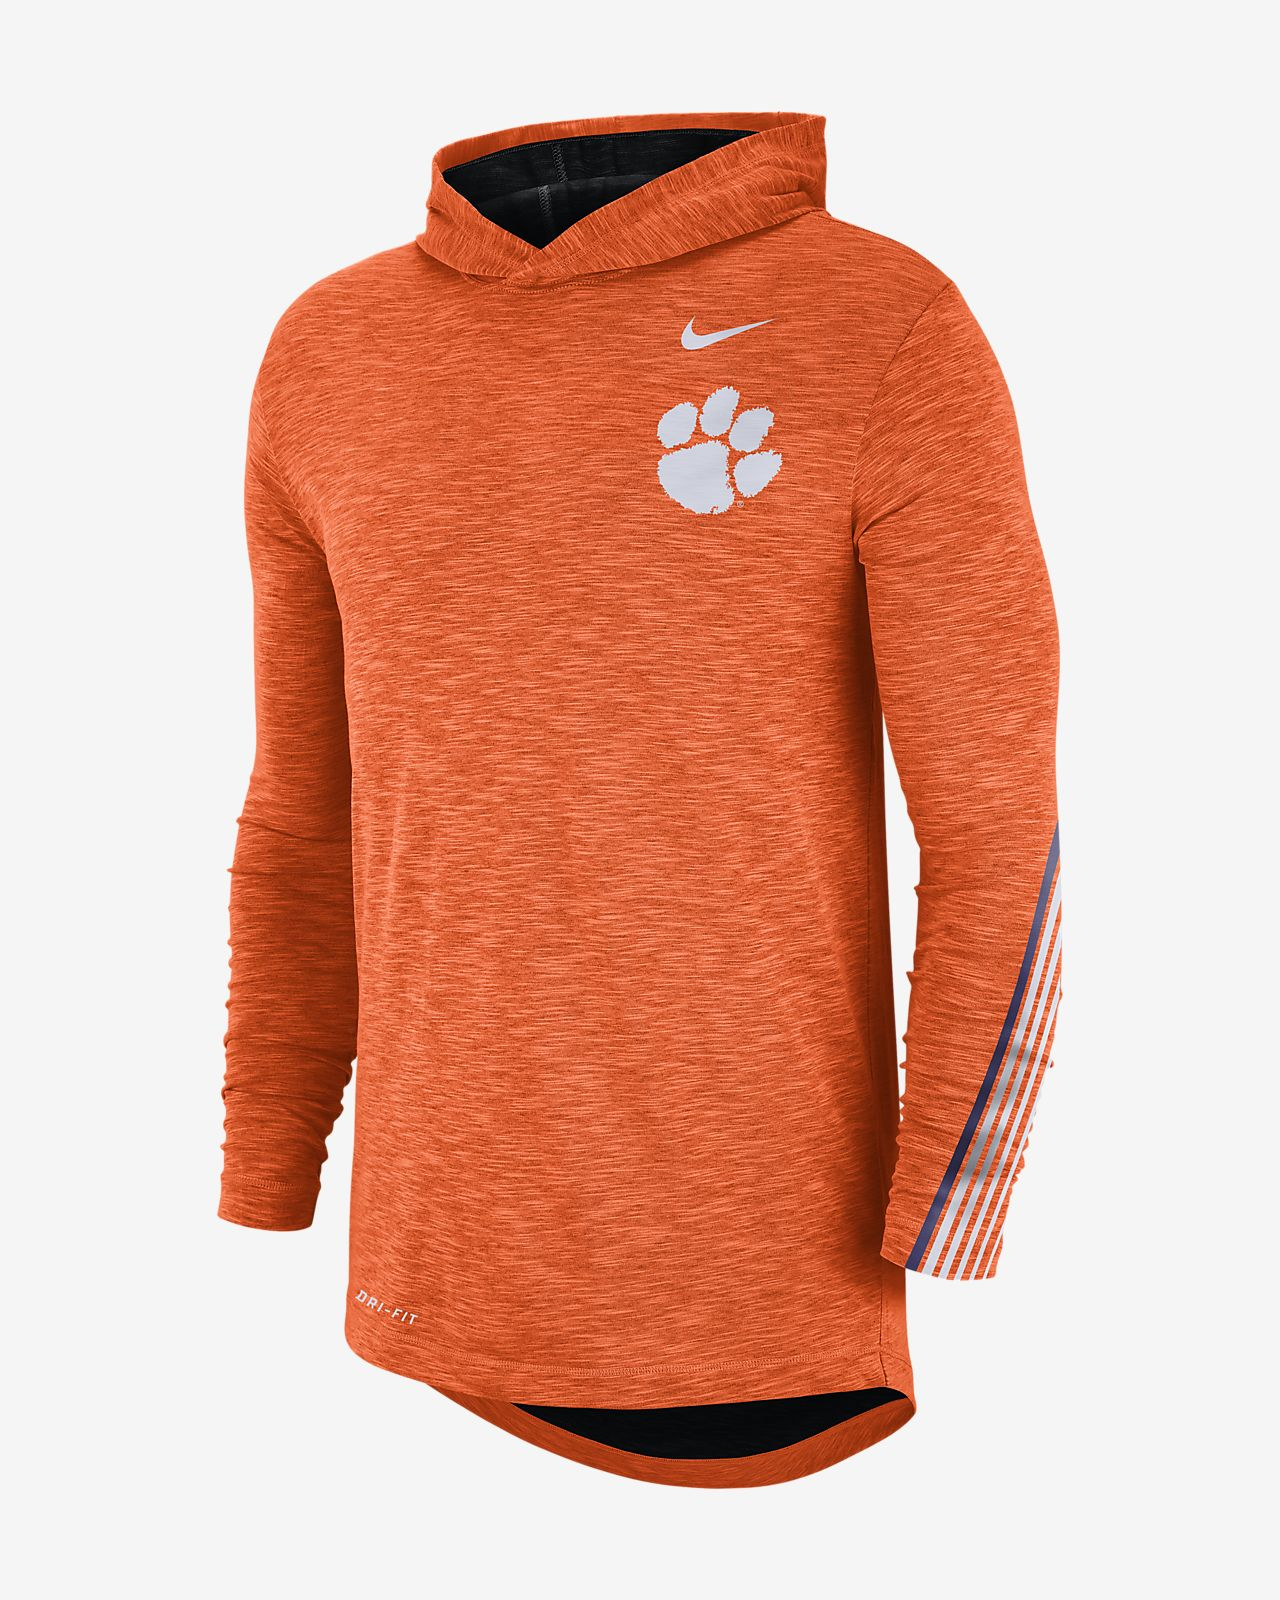 Nike College (Clemson) Men's Long-Sleeve Hooded T-Shirt